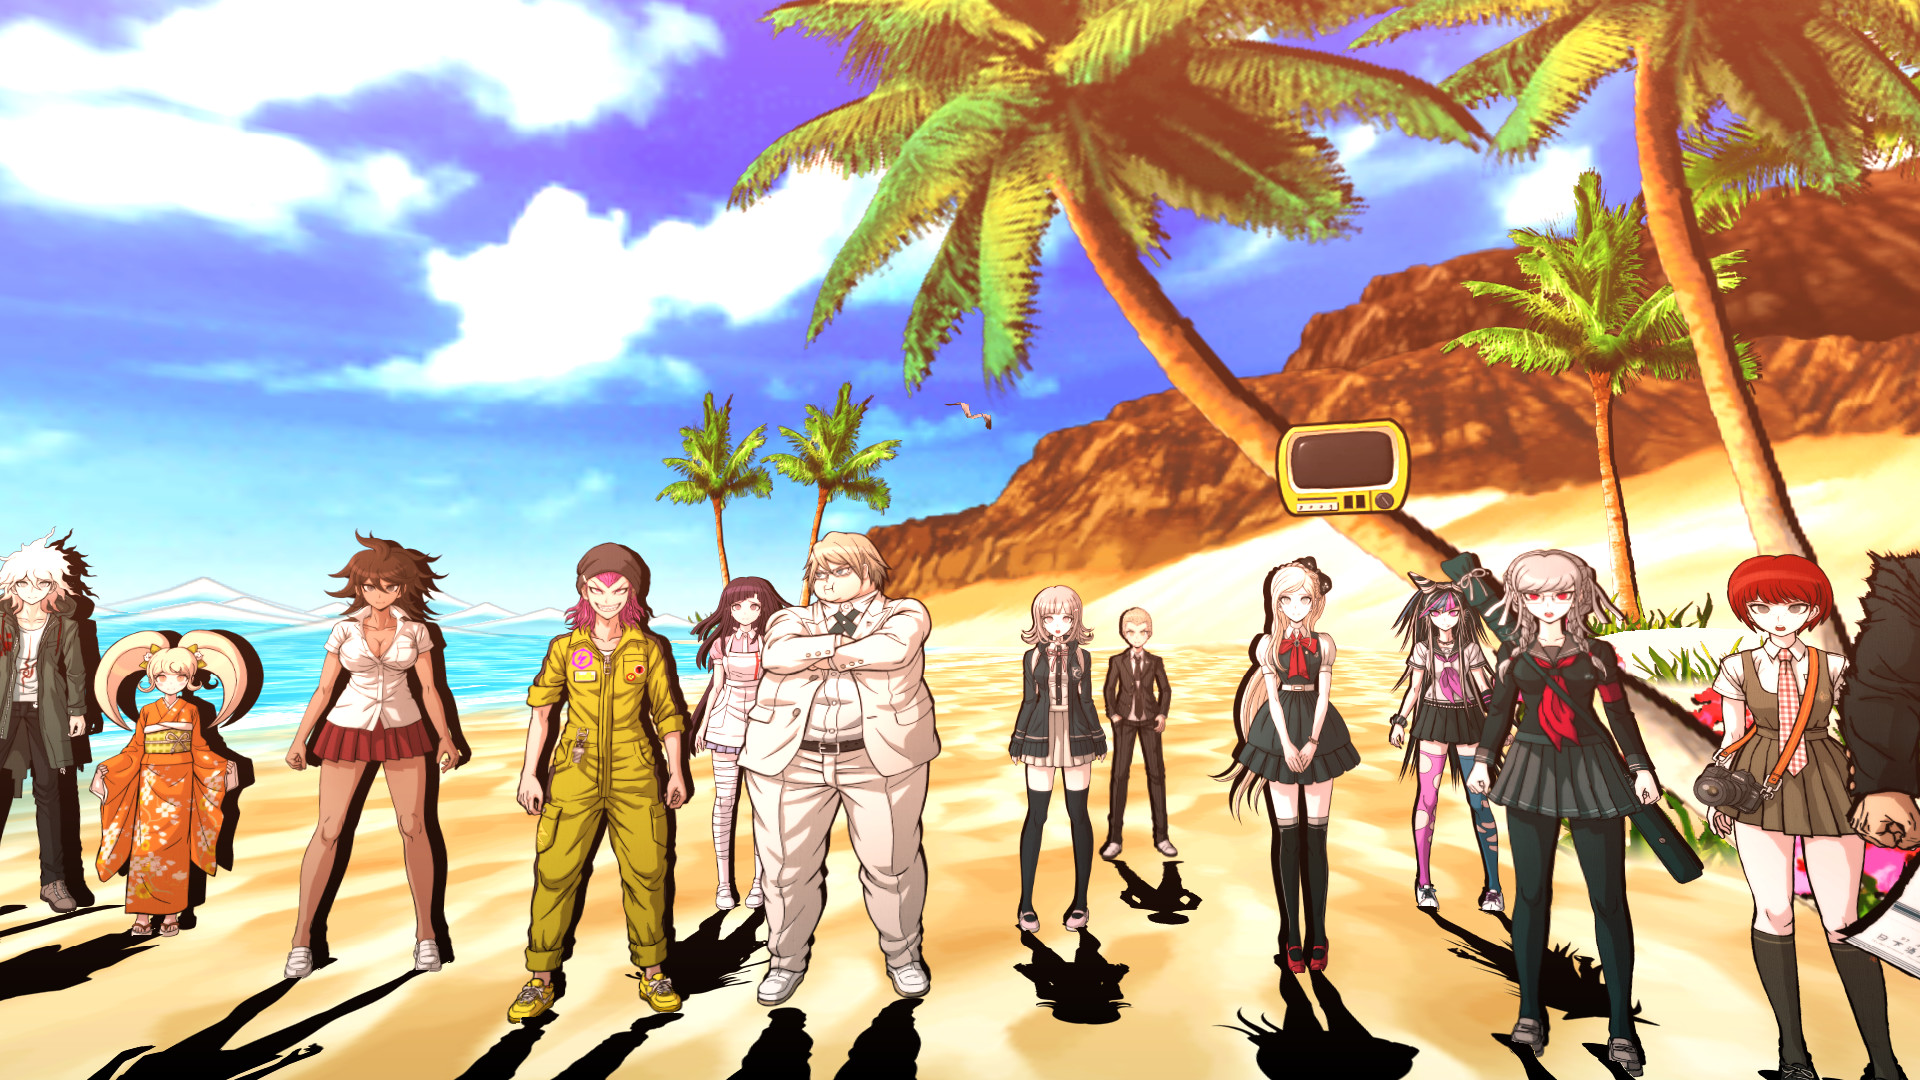 Danganronpa 2 Goodbye Despair Gameplay 1